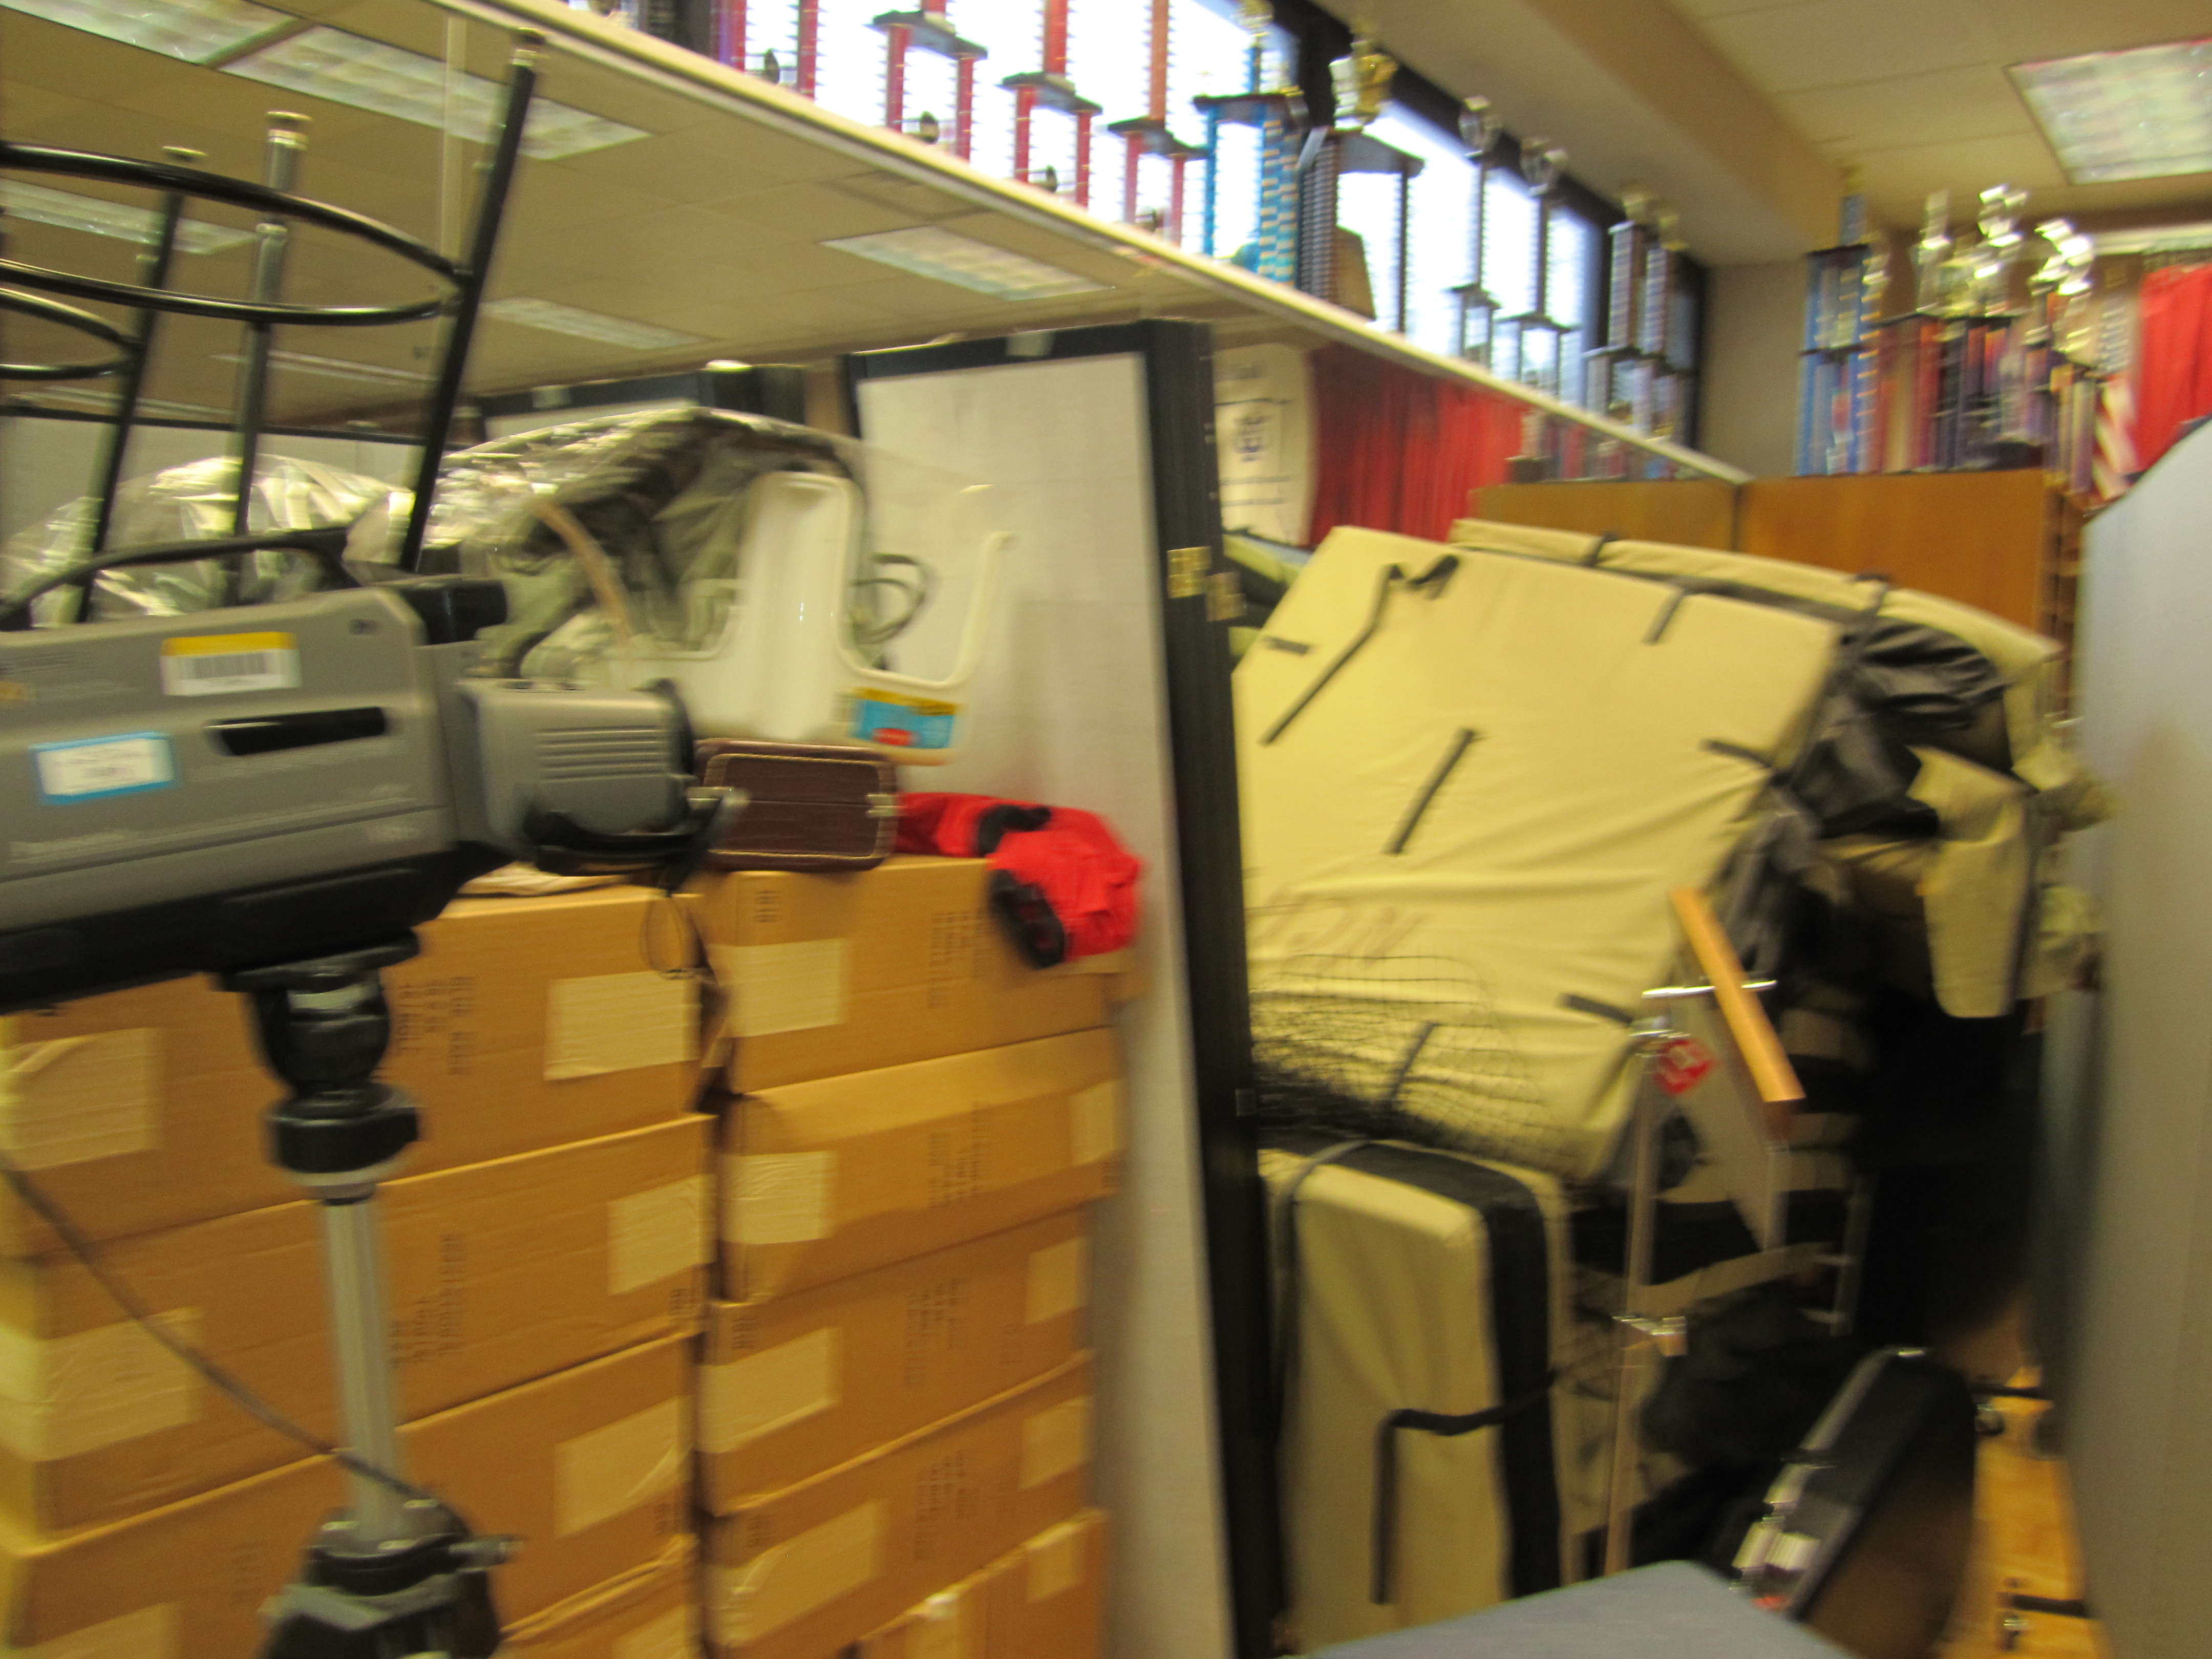 Room dividers hide storage area in a school office